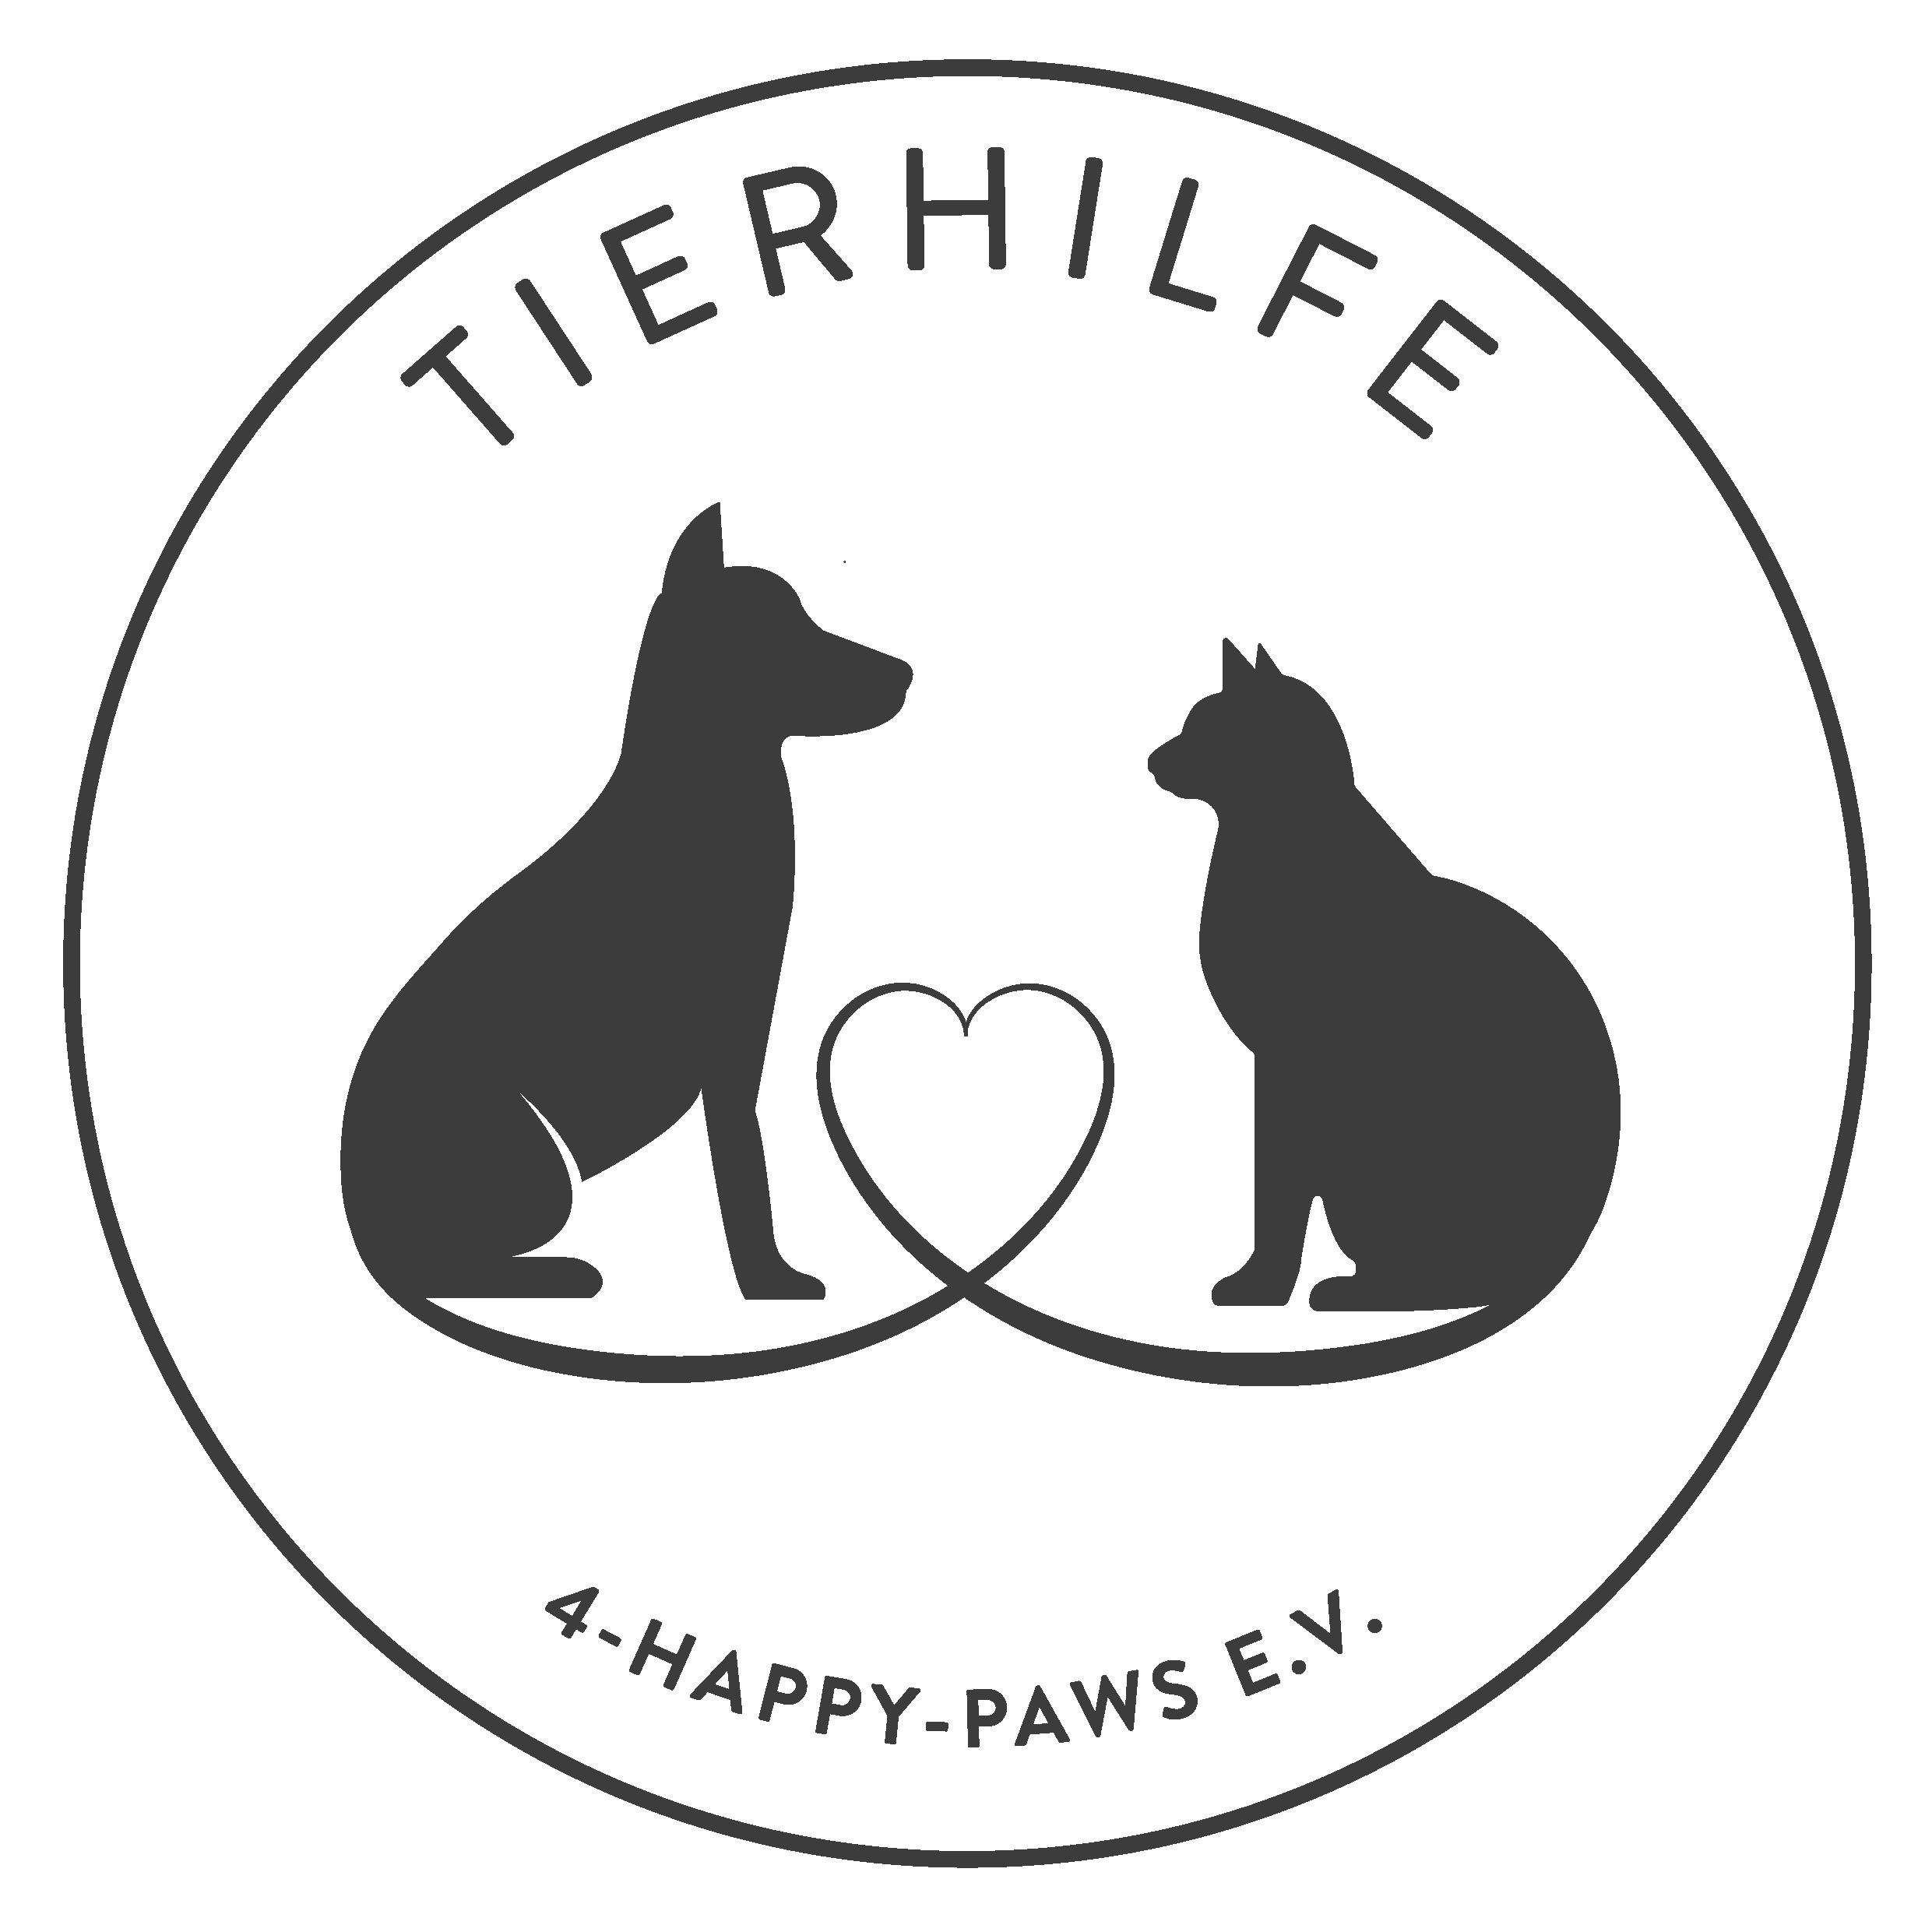 4-HAPPY-PAWS E.V. Tierhilfe Tiervermittlung